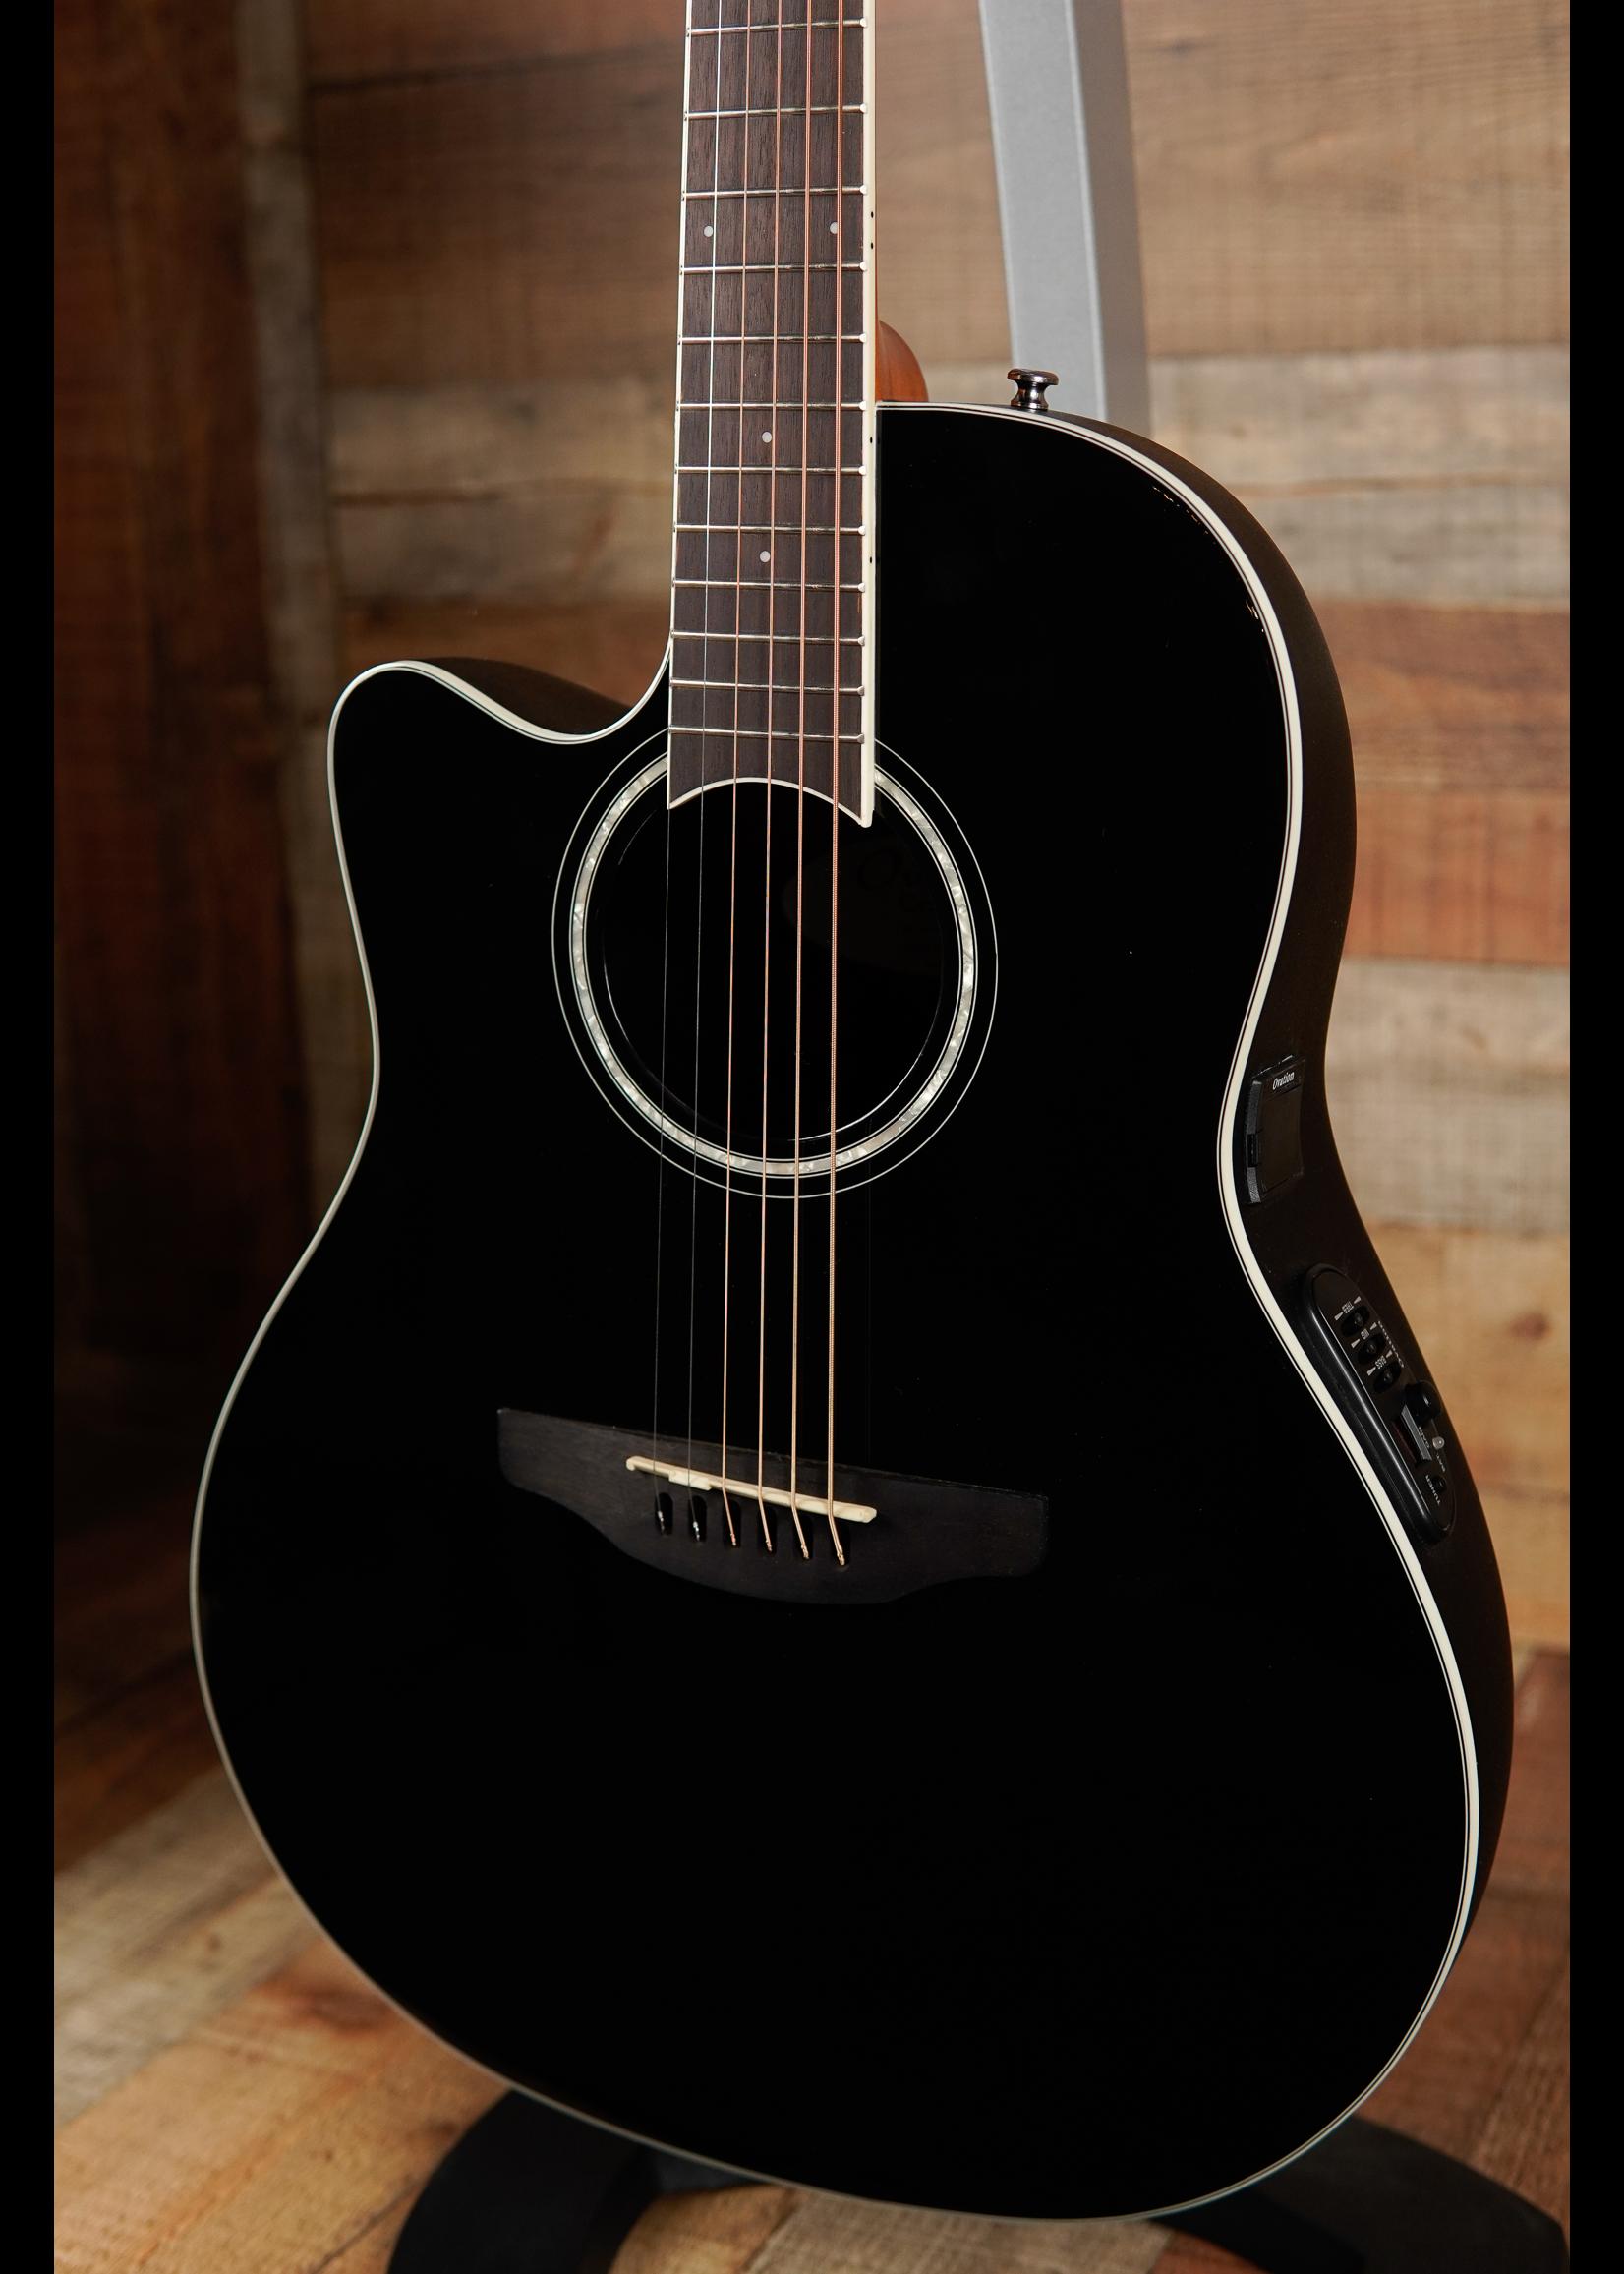 Ovation Ovation Celebrity Standard E-Acoustic Guitar CS24L-5G, CS/Cutaway, Black, Lefty,Mid-Depth